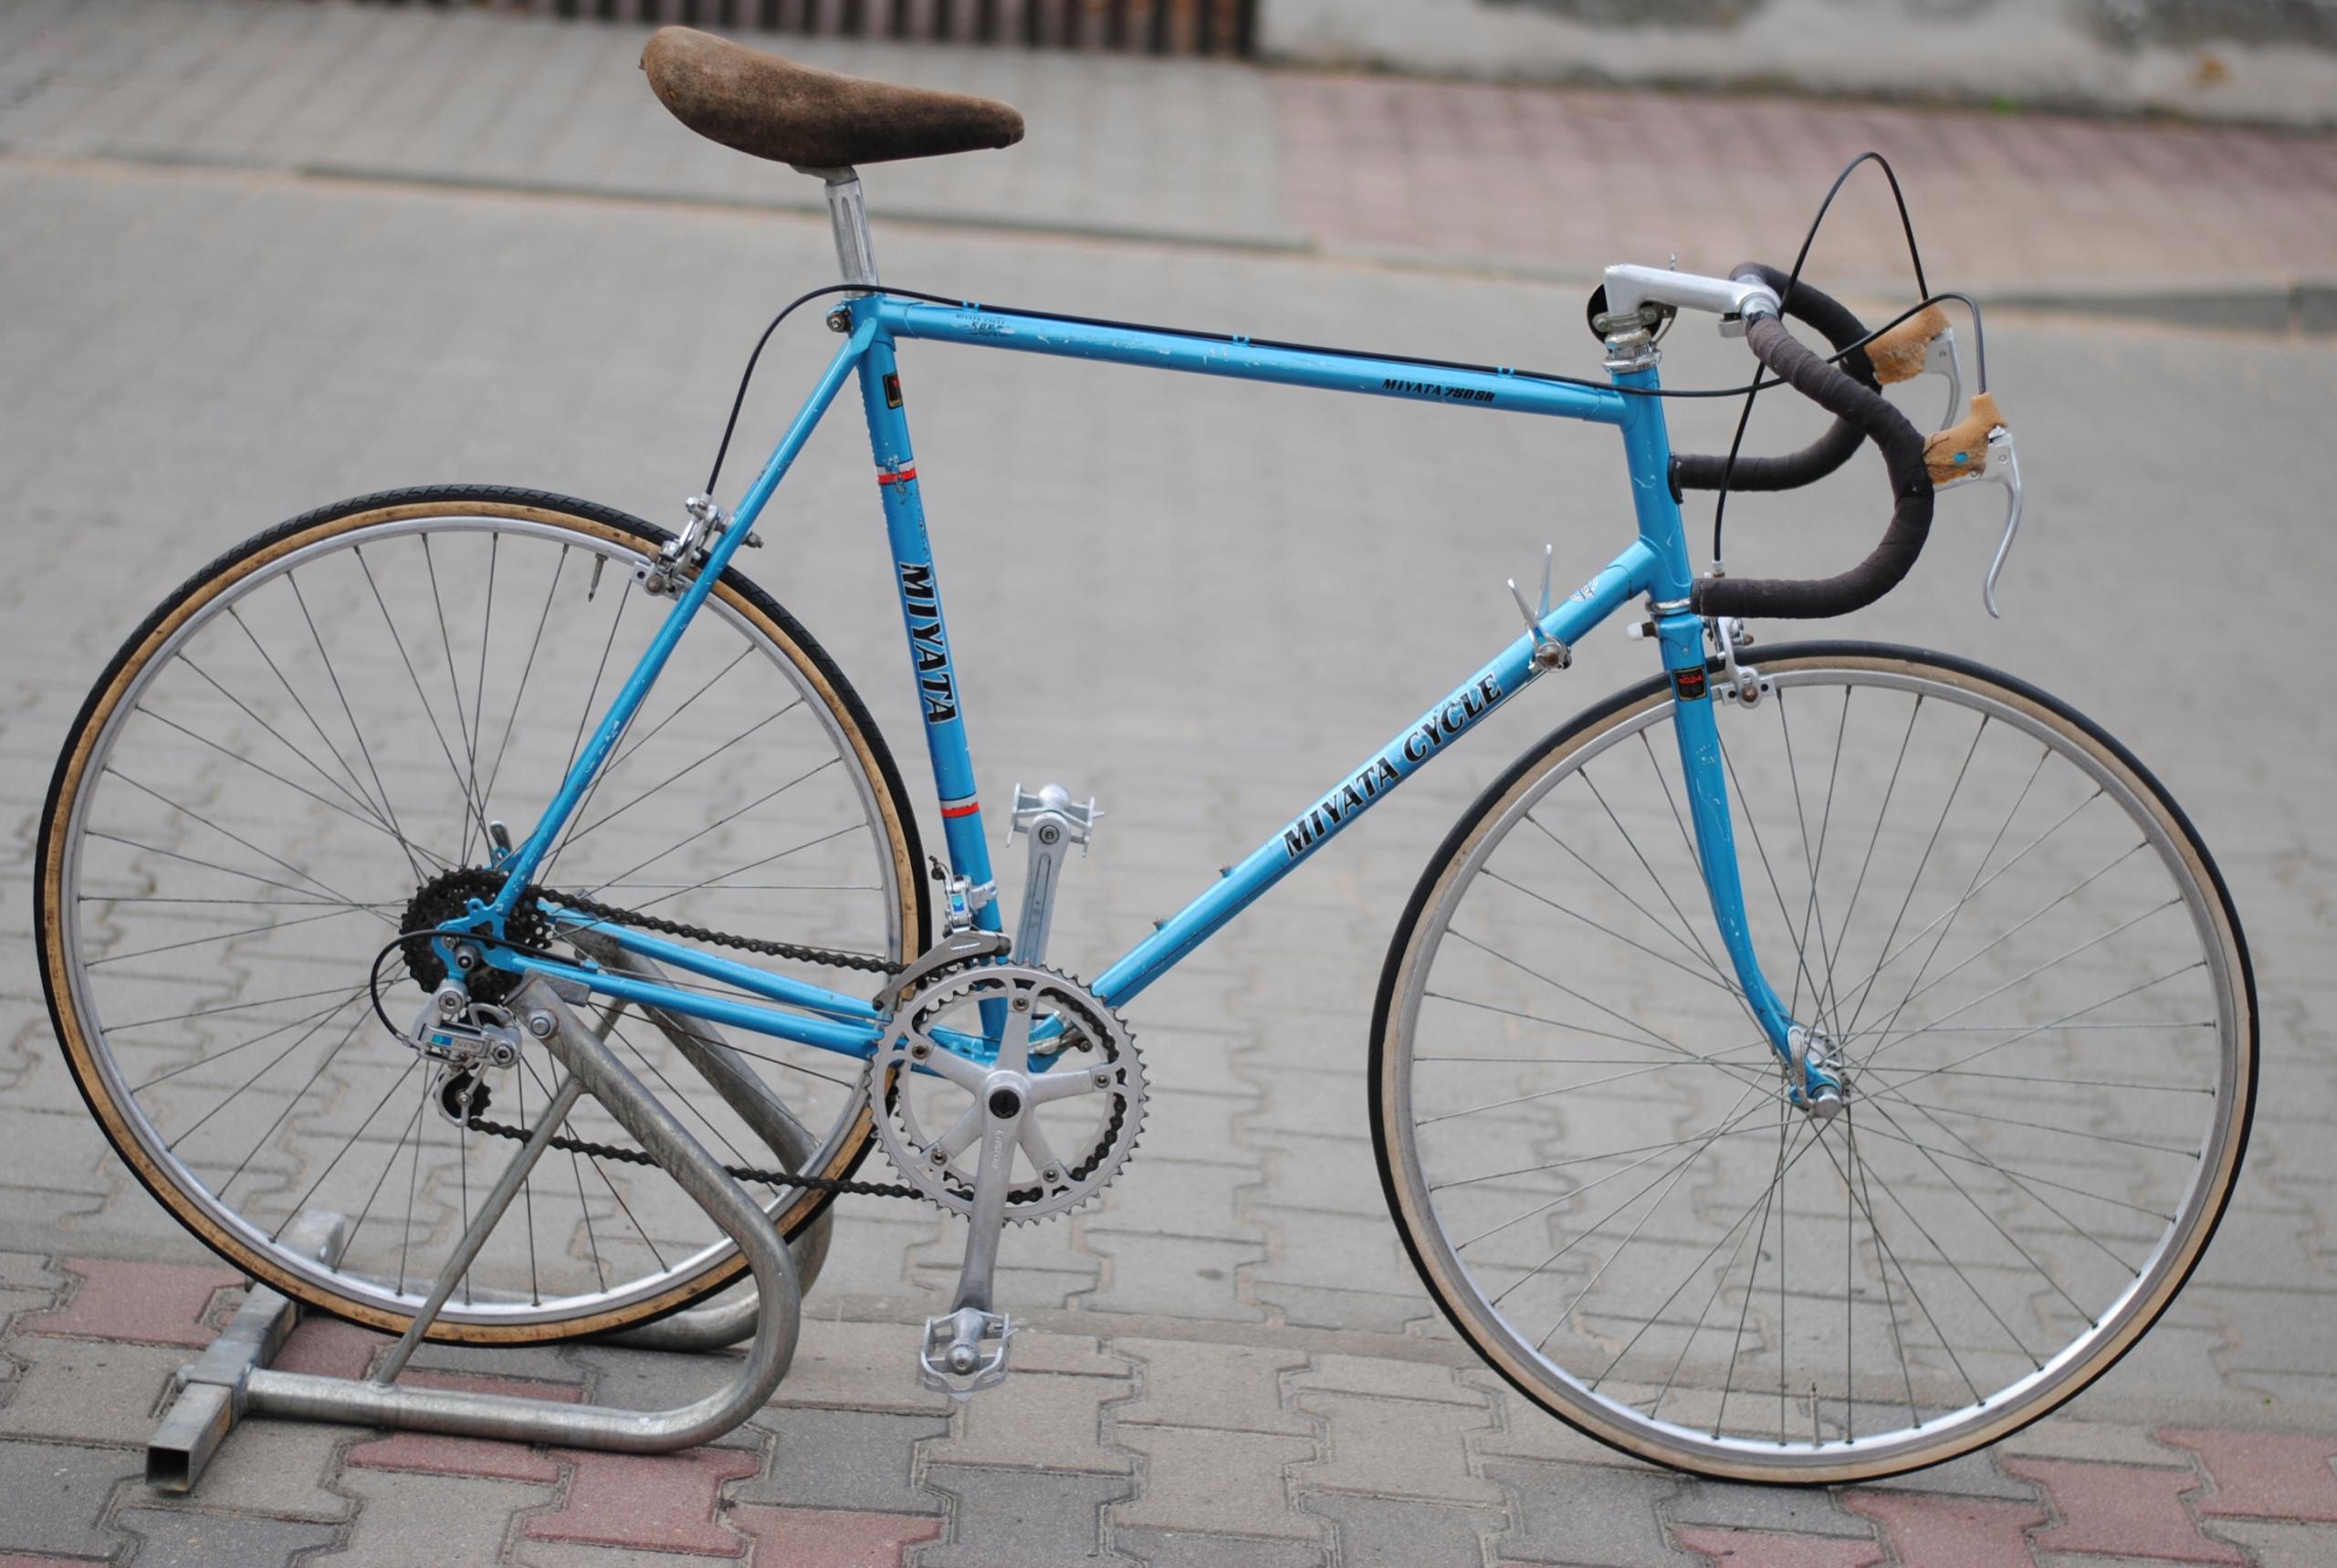 Szosa rower Szosowy Kolarzówka Koga RAMA 57 cm